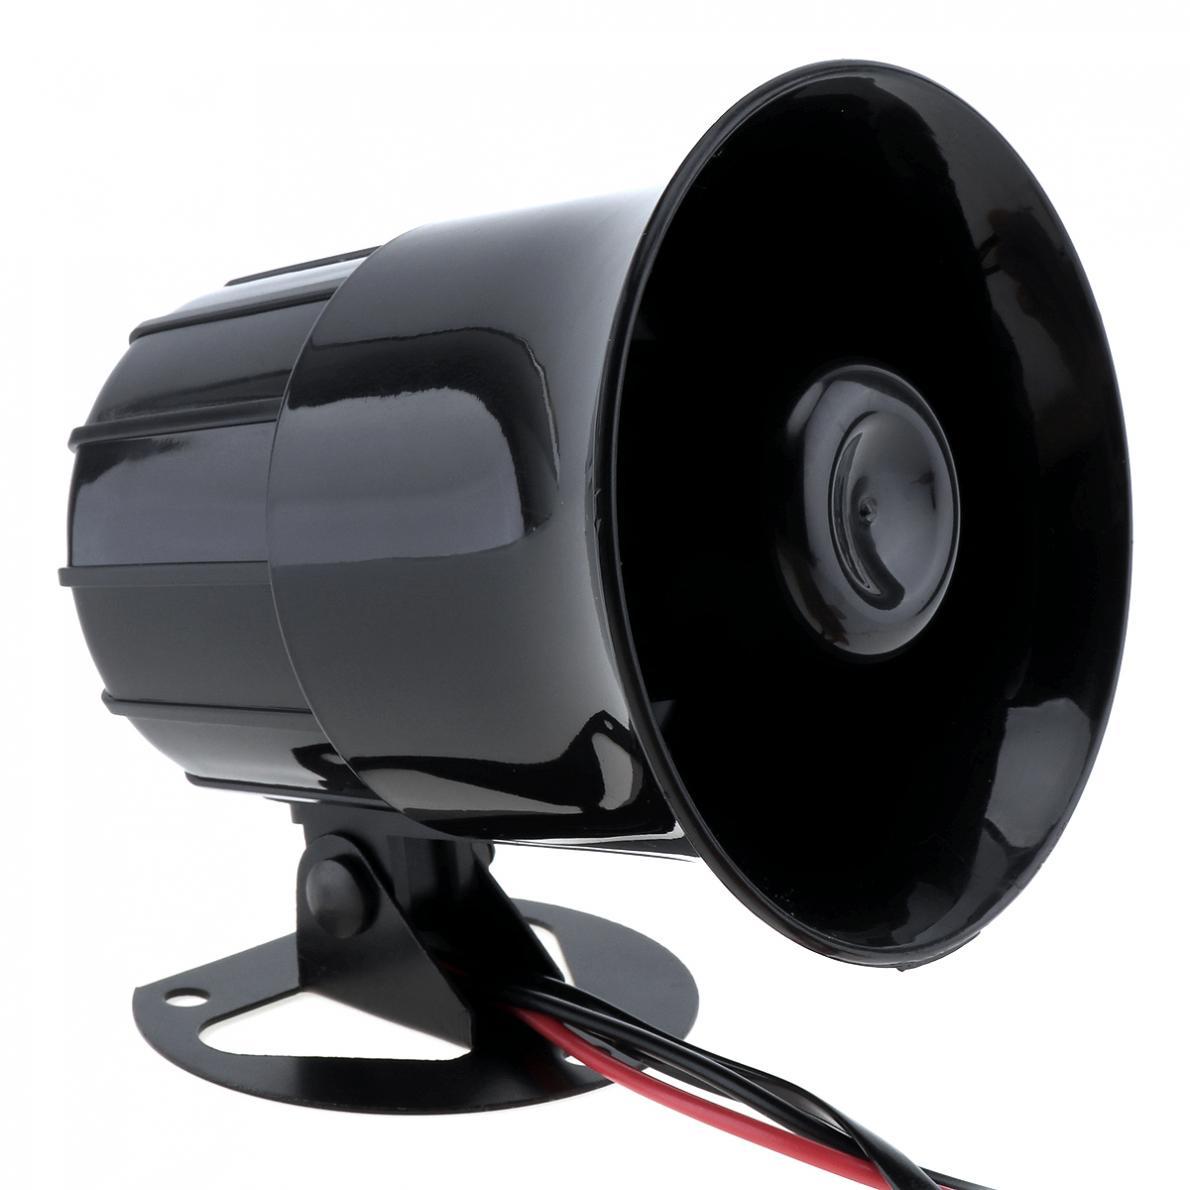 Siren Horn 30w 12v 3 Car Sound Speaker Super Loud 105db Multitone 20373 Description 10 L2